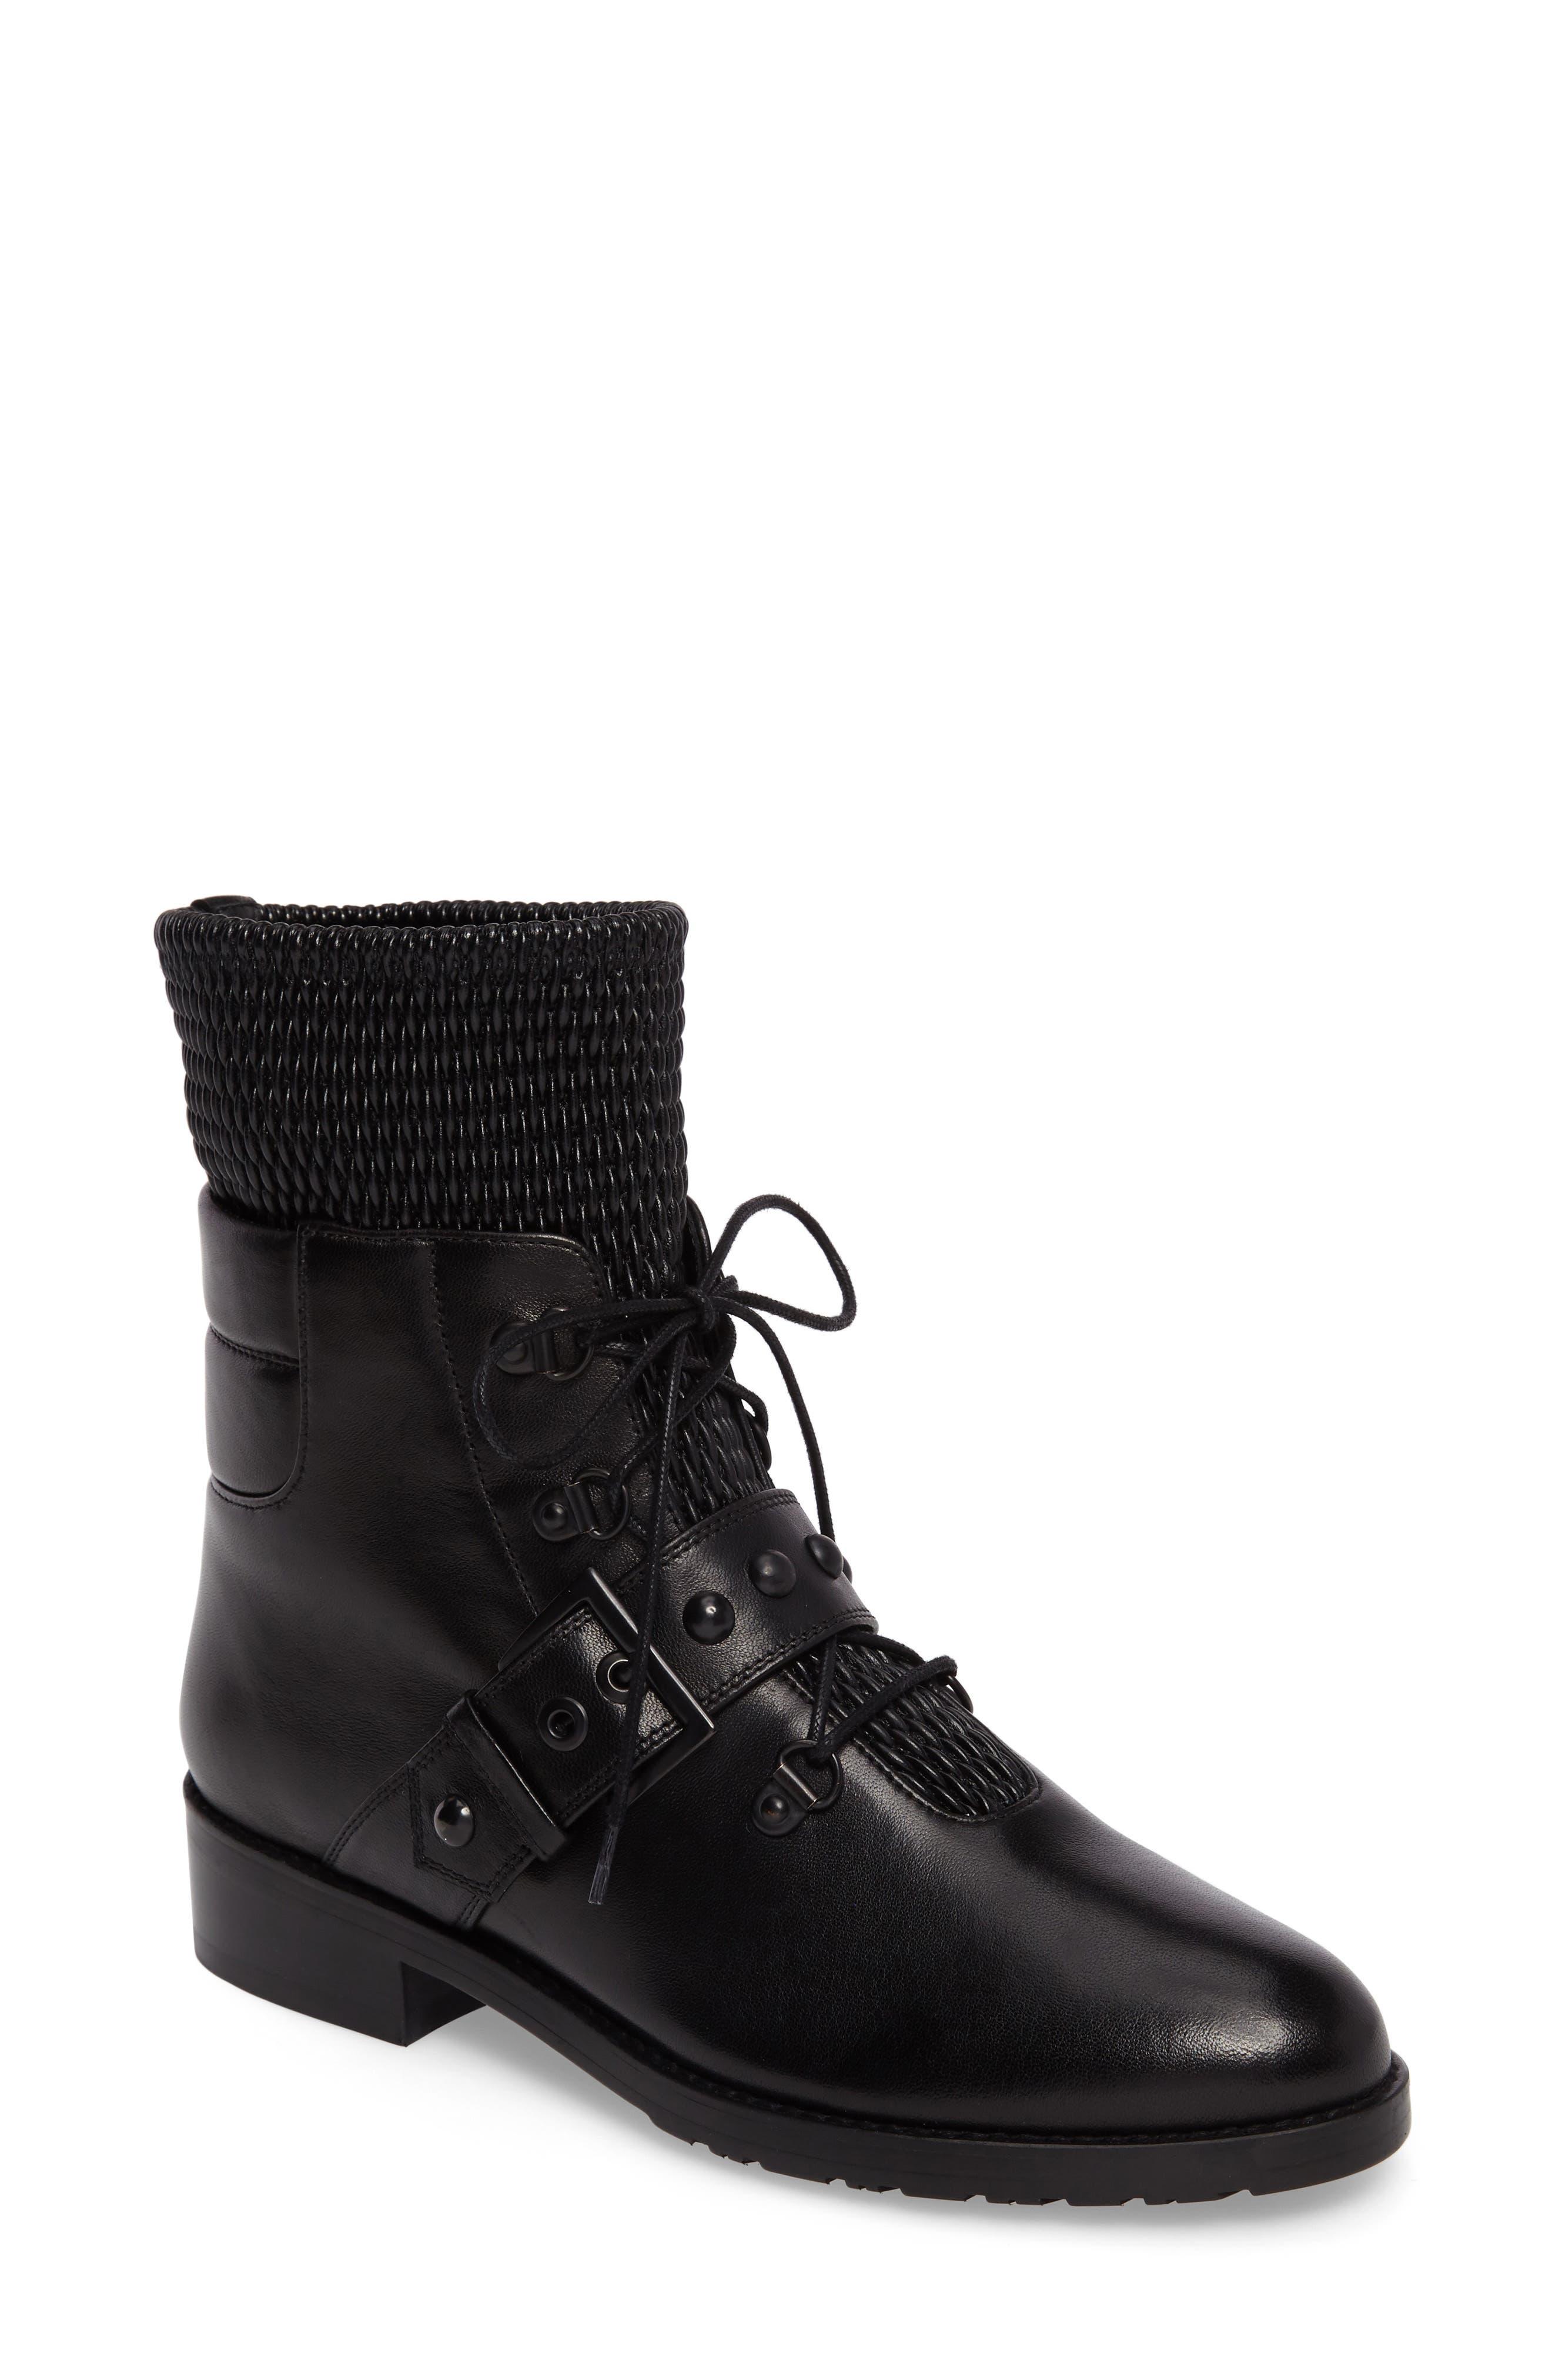 Main Image - Stuart Weitzman Stitchwork Combat Boot (Women)